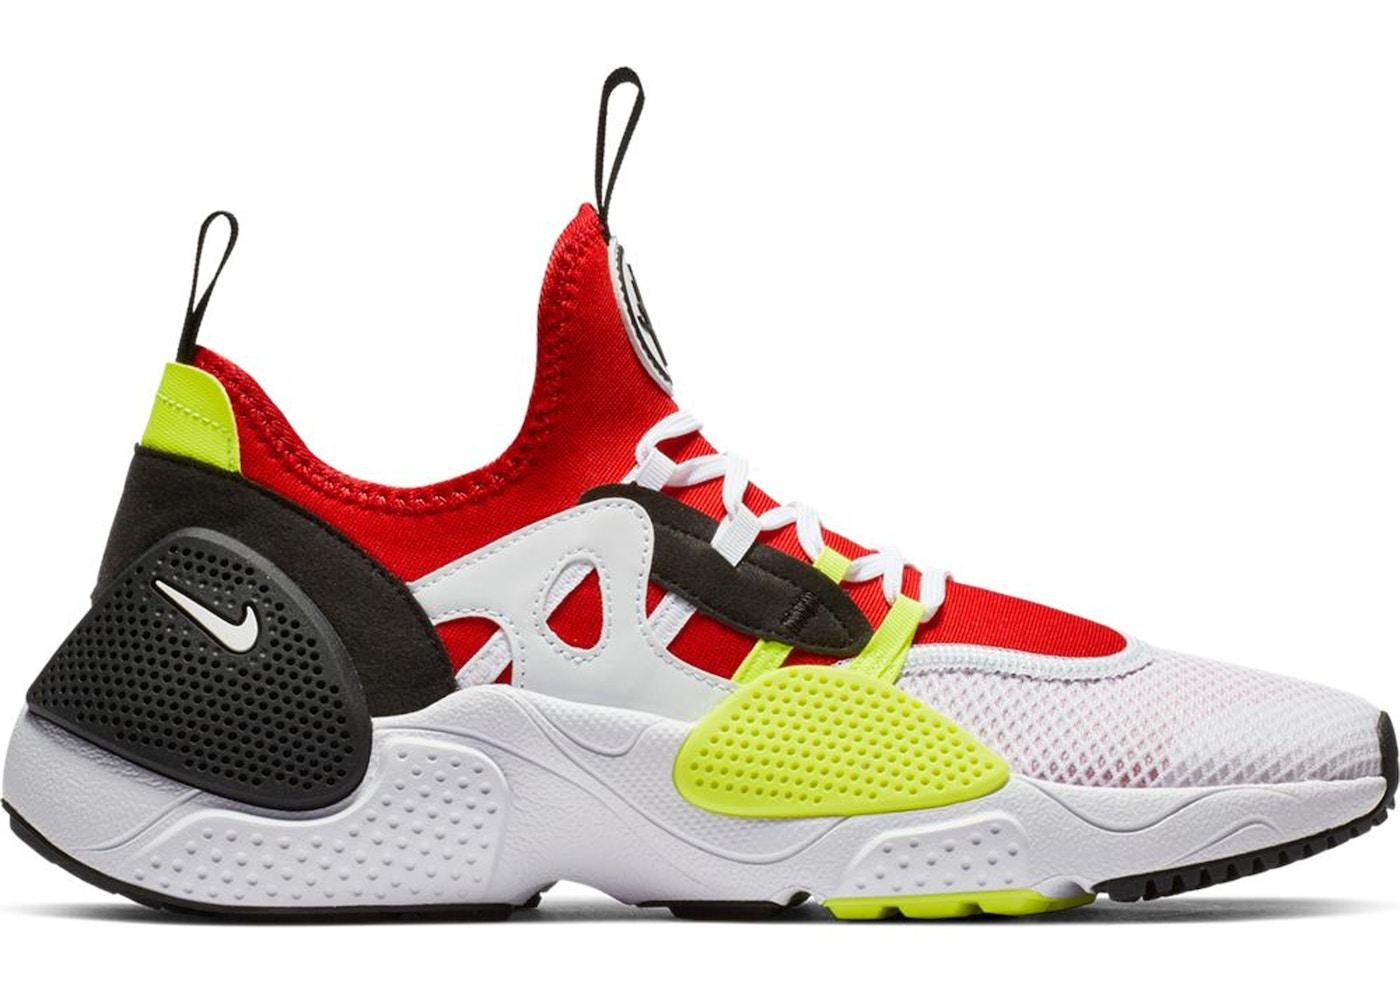 newest 5dfc5 aec14 Nike Huarache Edge Txt White University Red Volt Black